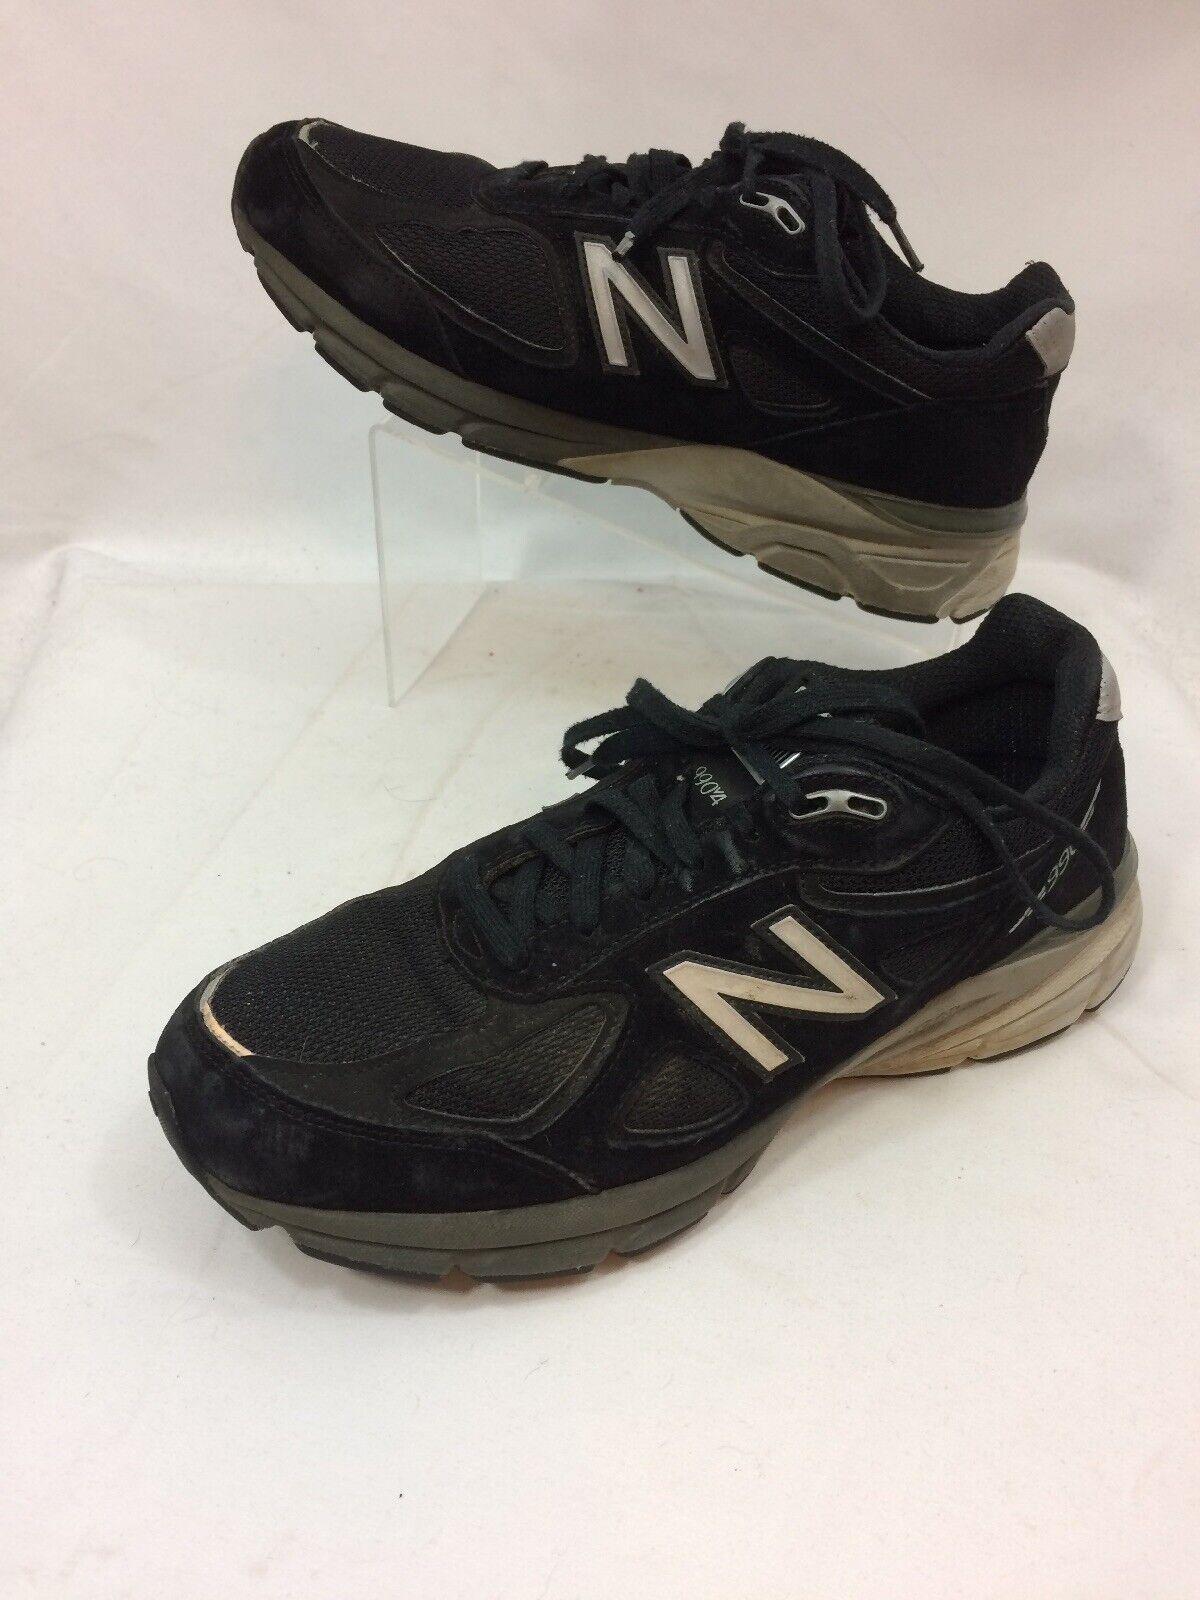 New Balance 990v4 10.5 US 2E Mens Running Black  Excellent